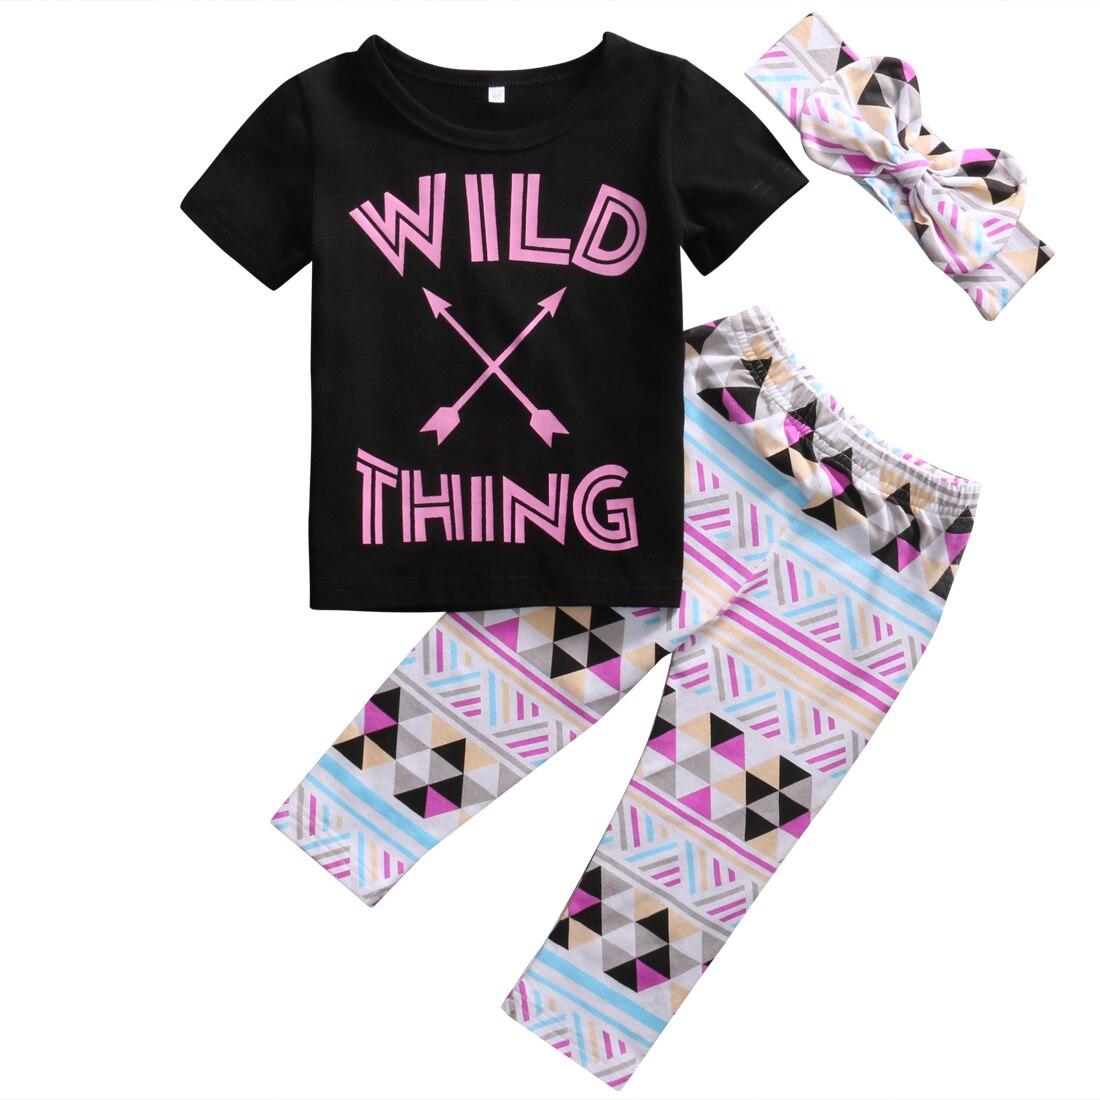 3PCS Set Toddler Kids Girl Clothes 2017 Summer Wild Thing Print T-shirt Top +Pant Legging Headband Outfits Children Clothing Set wild thing